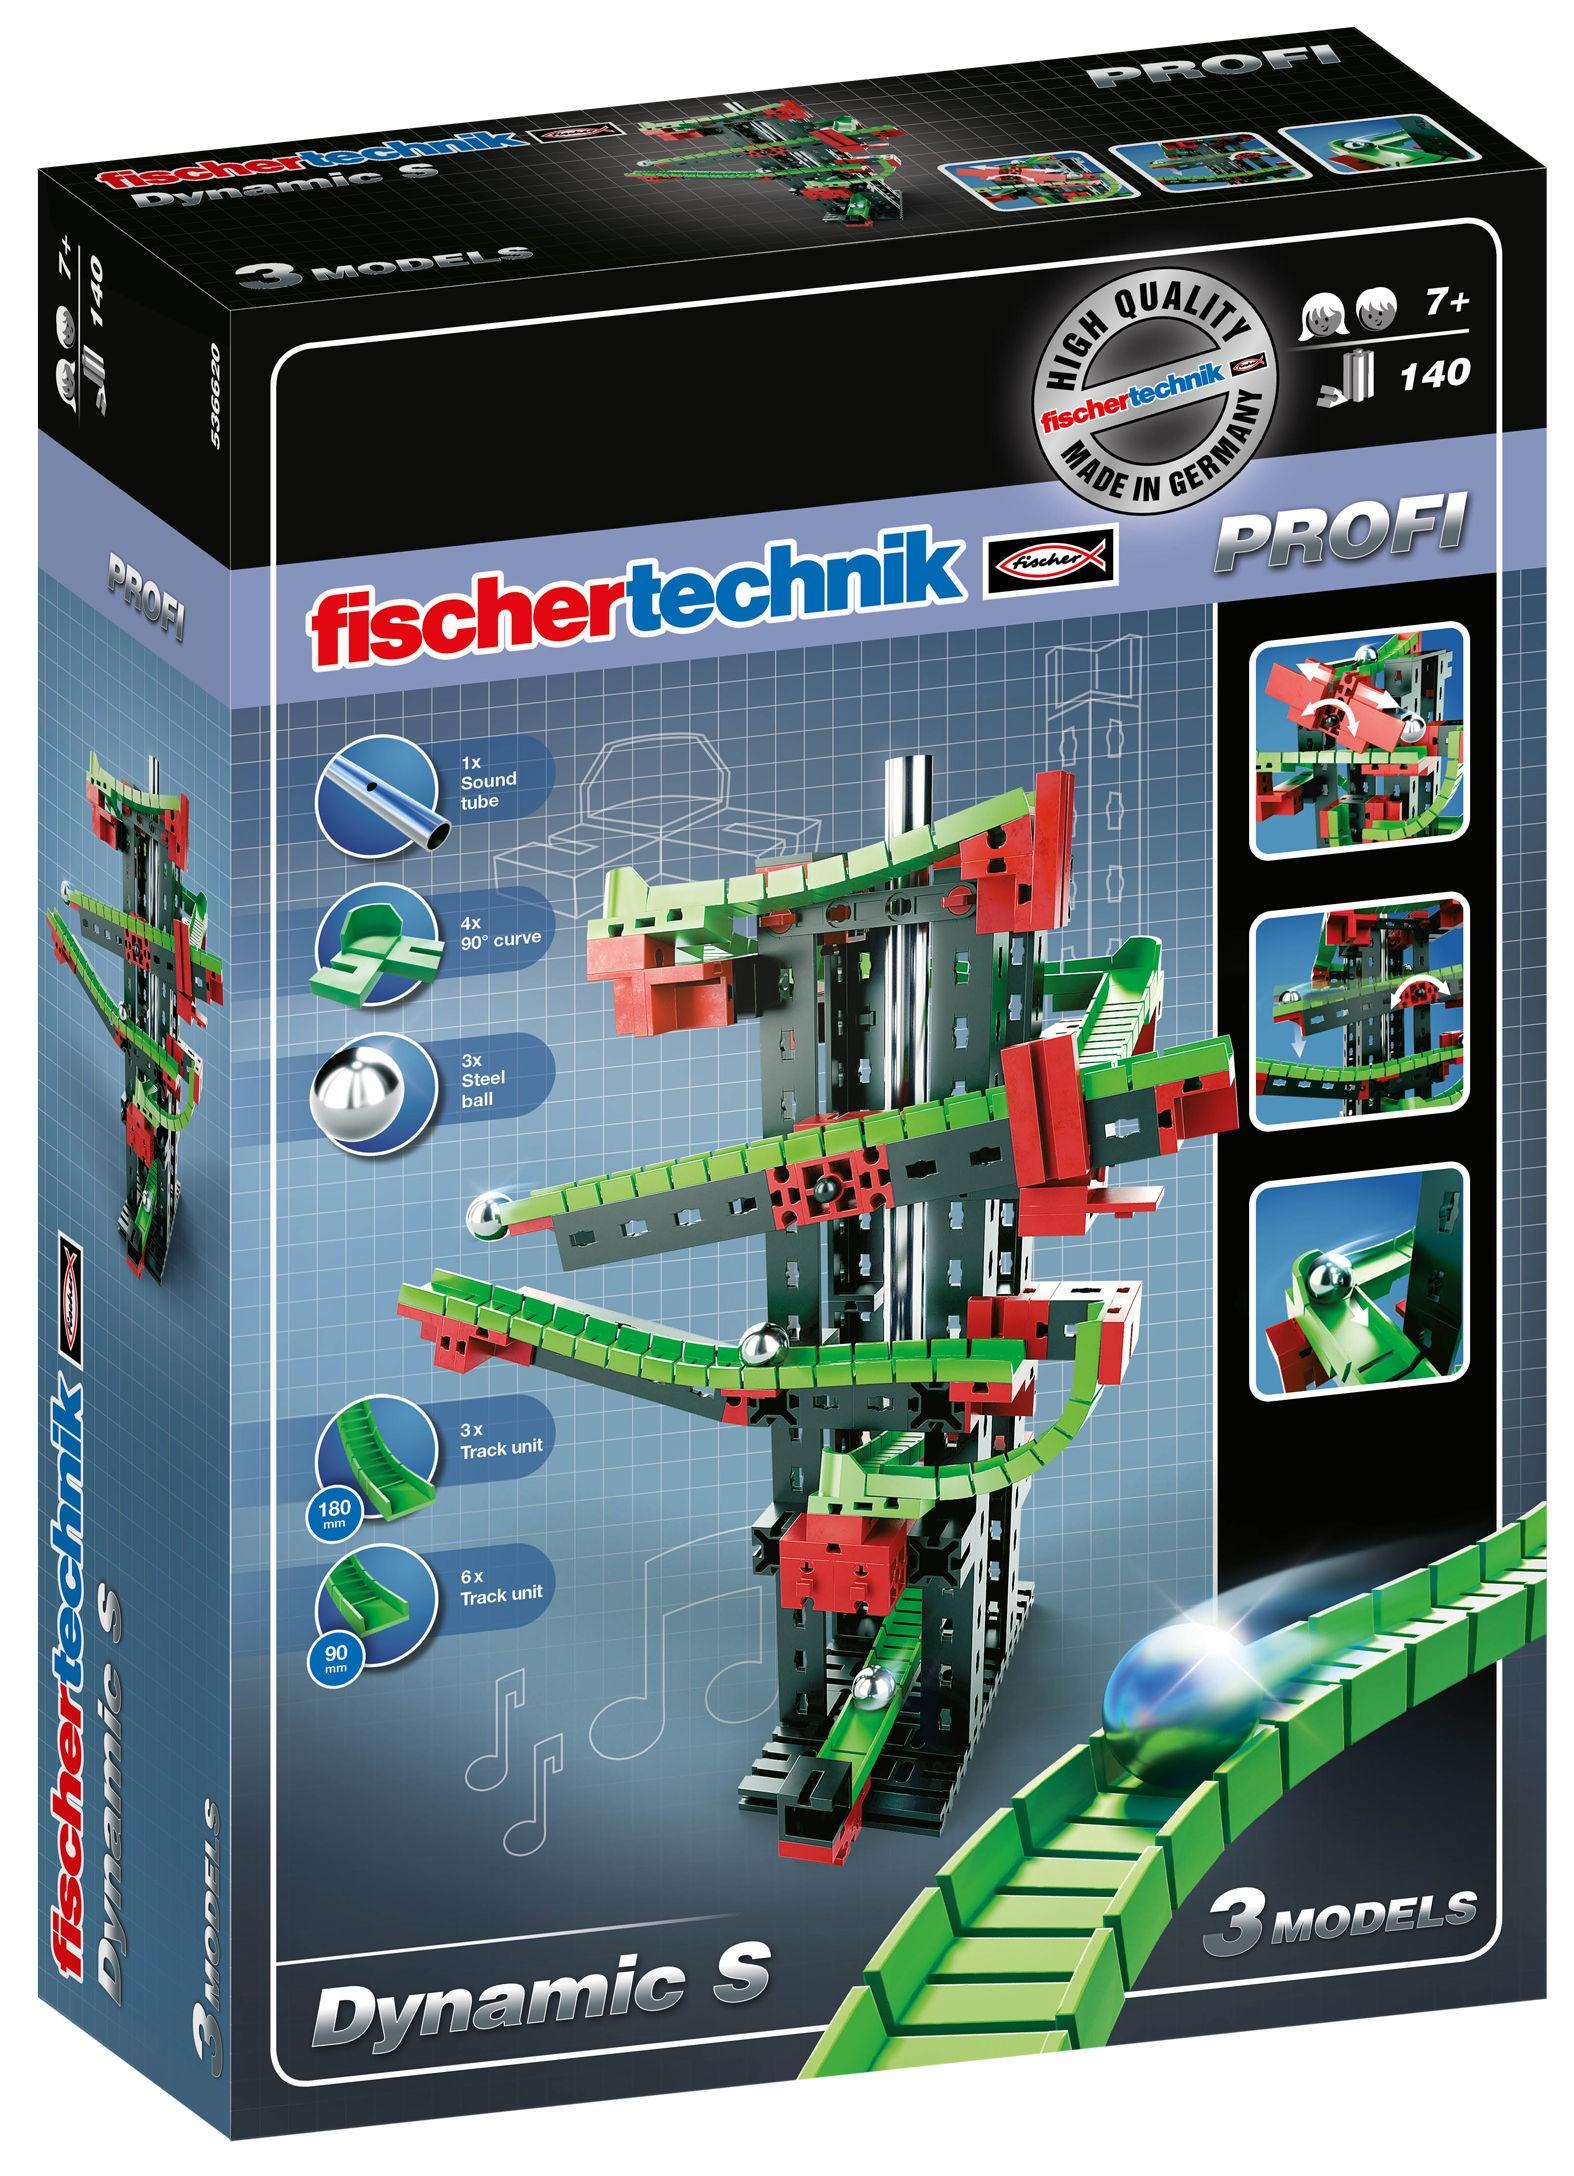 Dynamic S Baukasten - Kugelbahn Fischertechnik